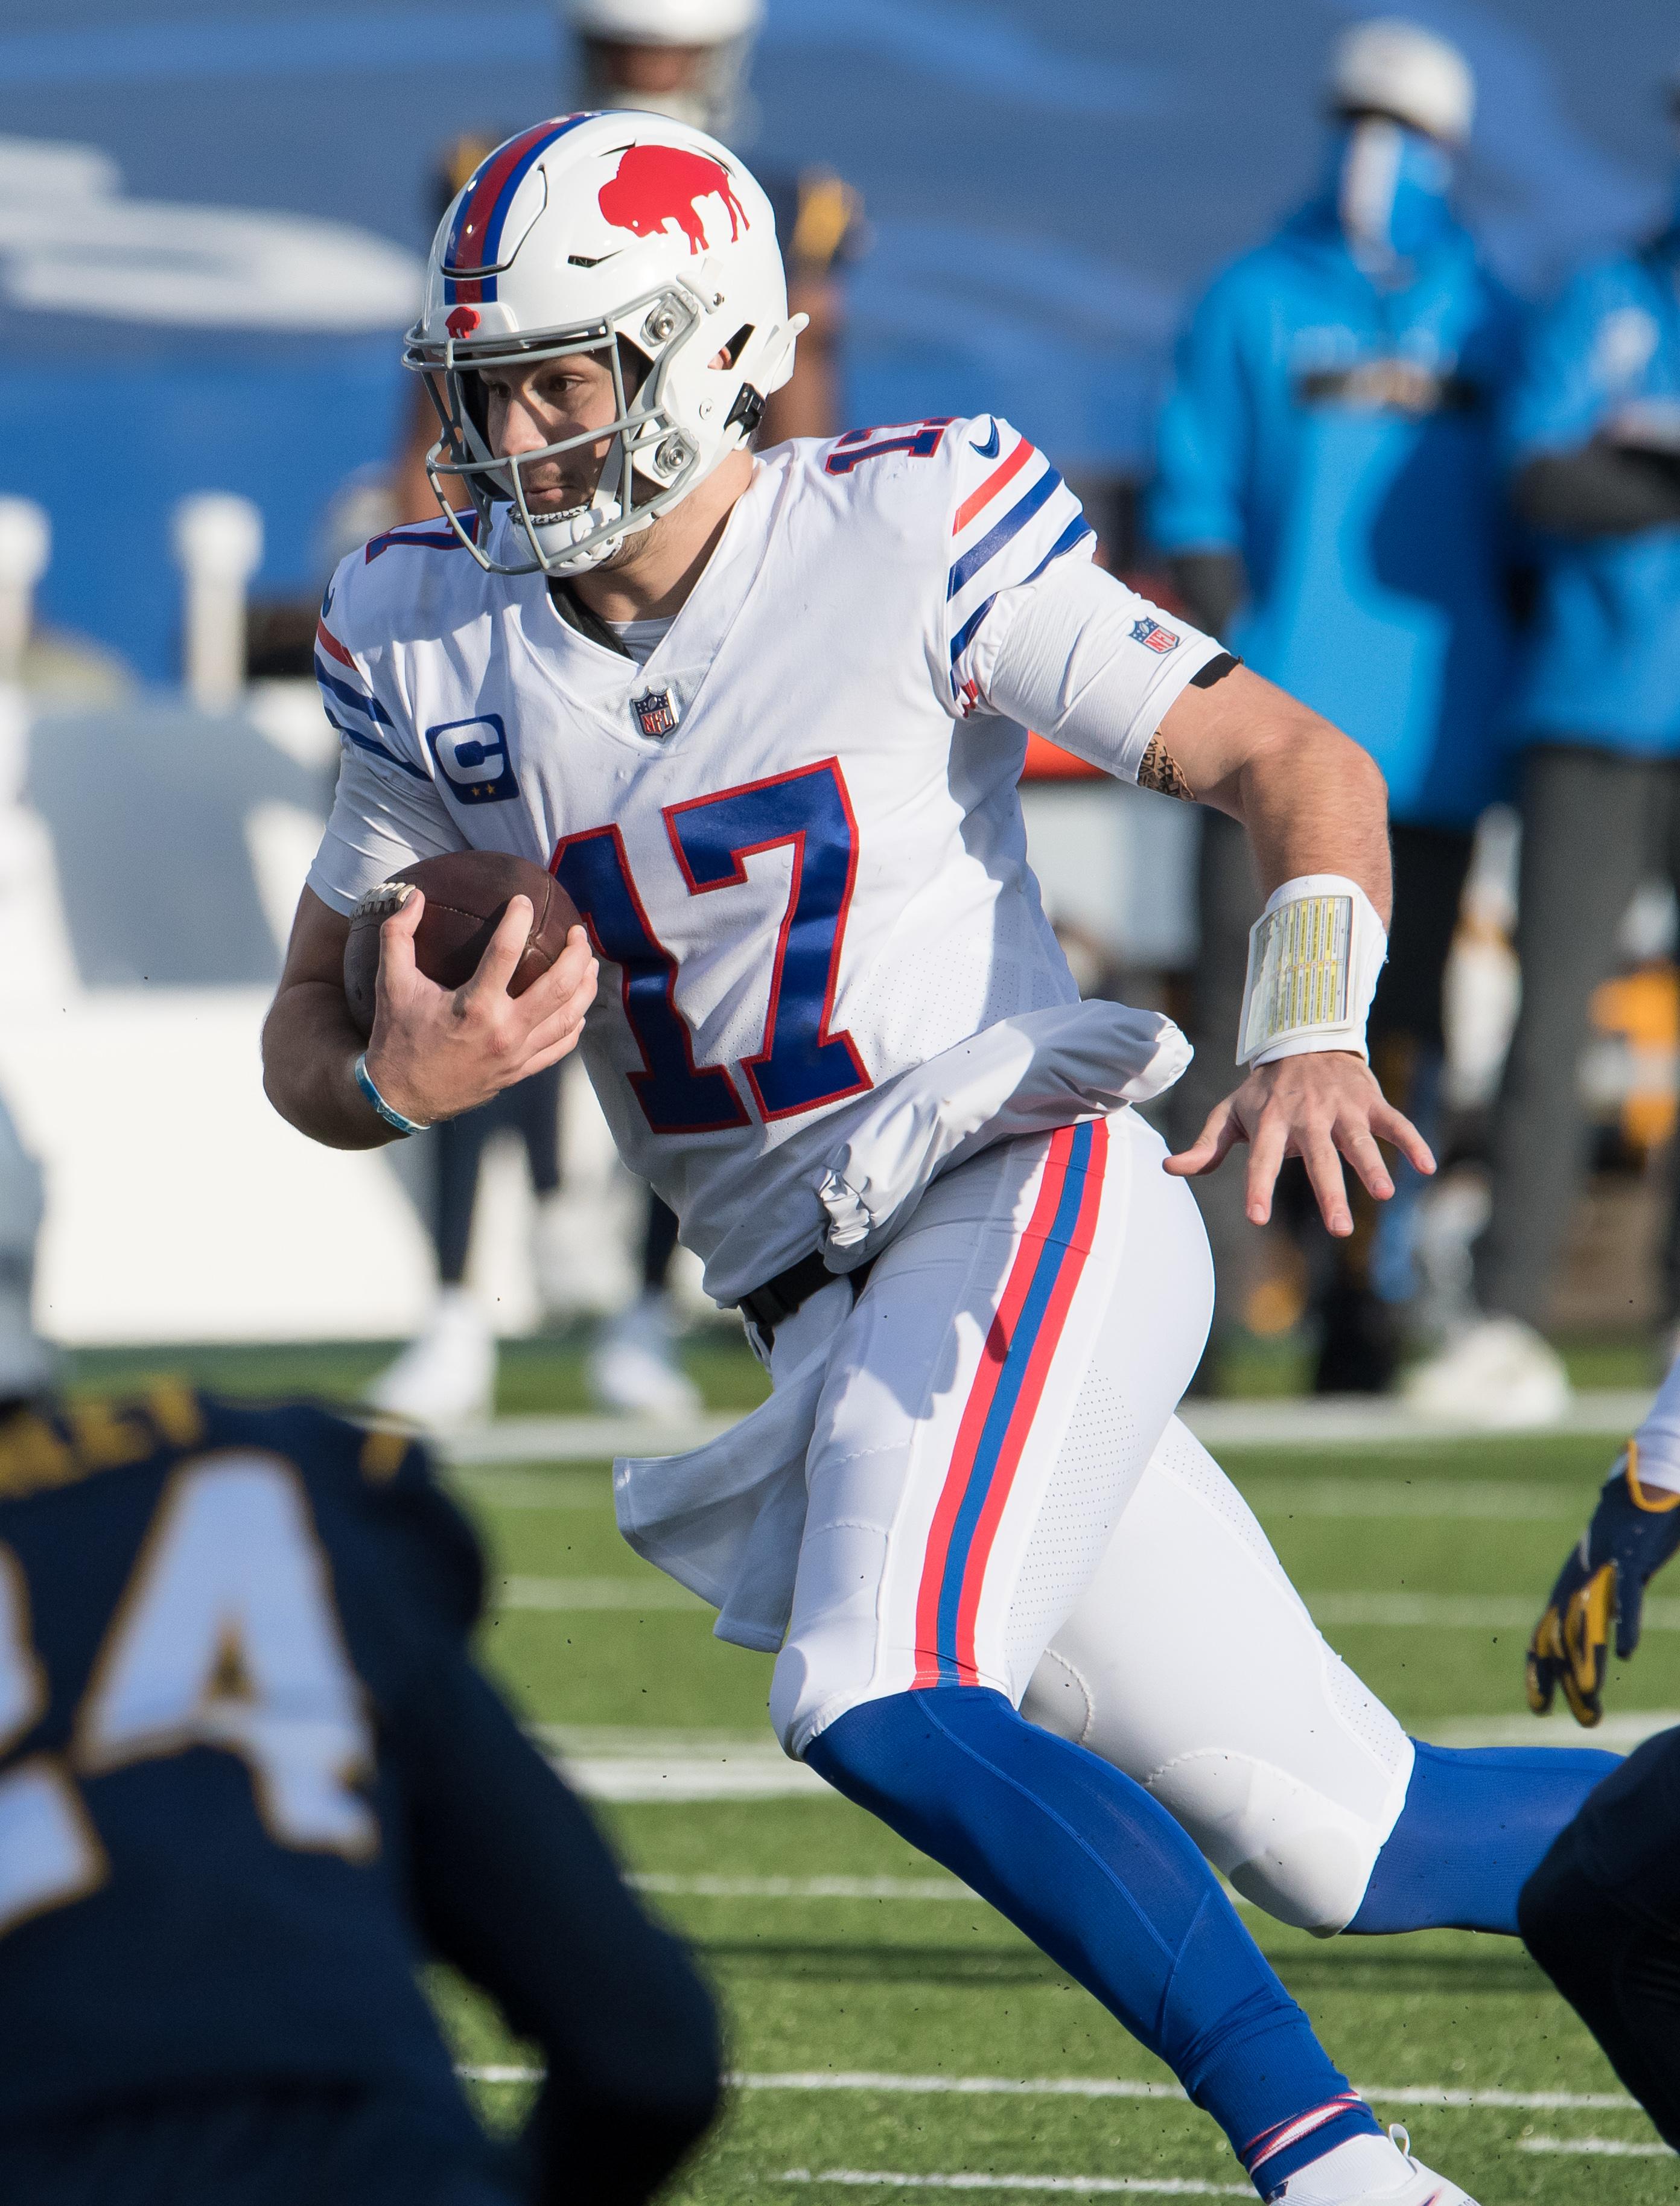 Buffalo Bills quarterback Josh Allen runs for a first down in the second quarter at Bills Stadium.